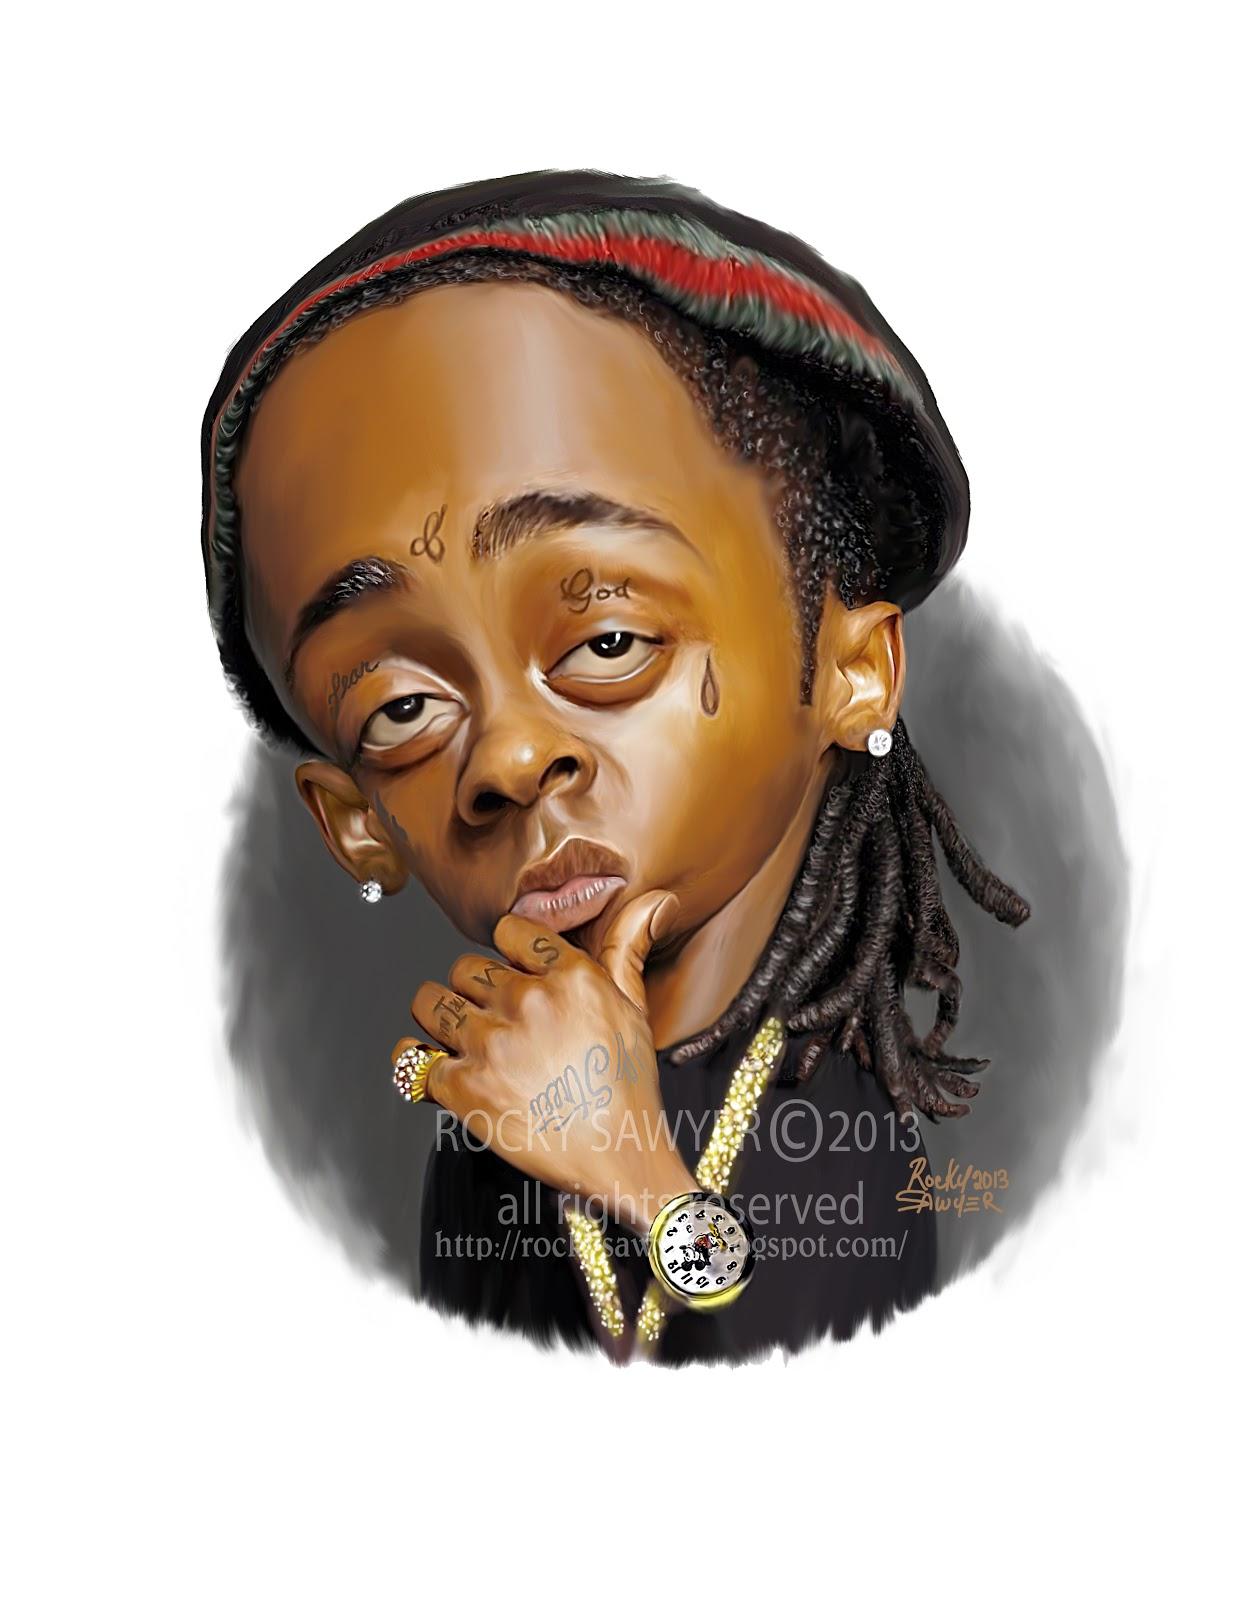 Sawyer Illustration Inc. caricature and cartoon art studio: Lil' Wayne